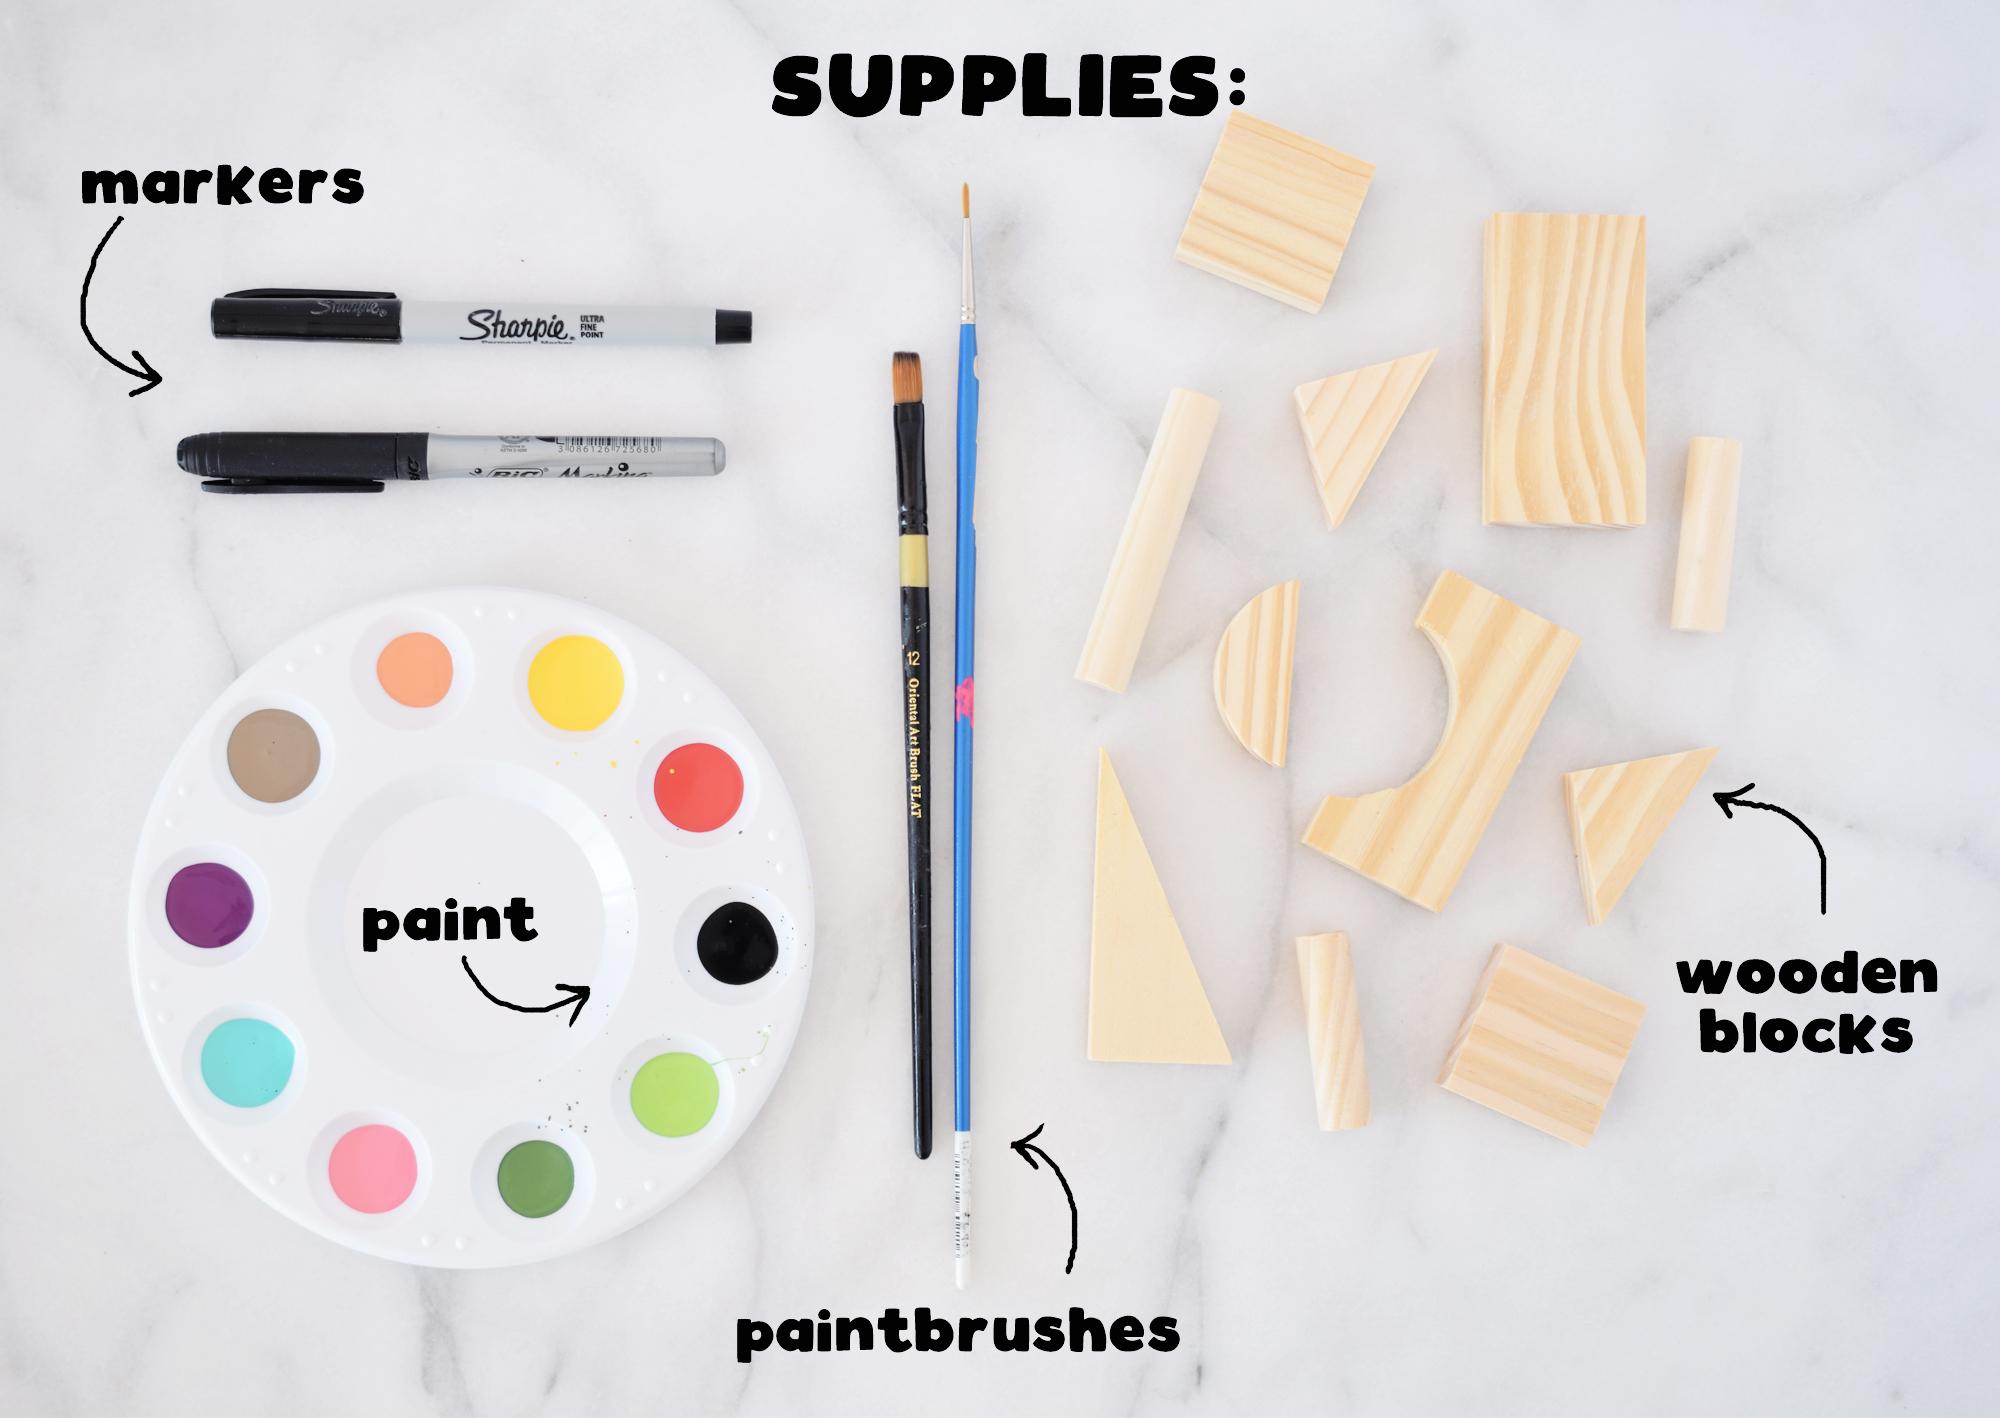 Kids Painted Toy Blocks DIY craft - supplies needed